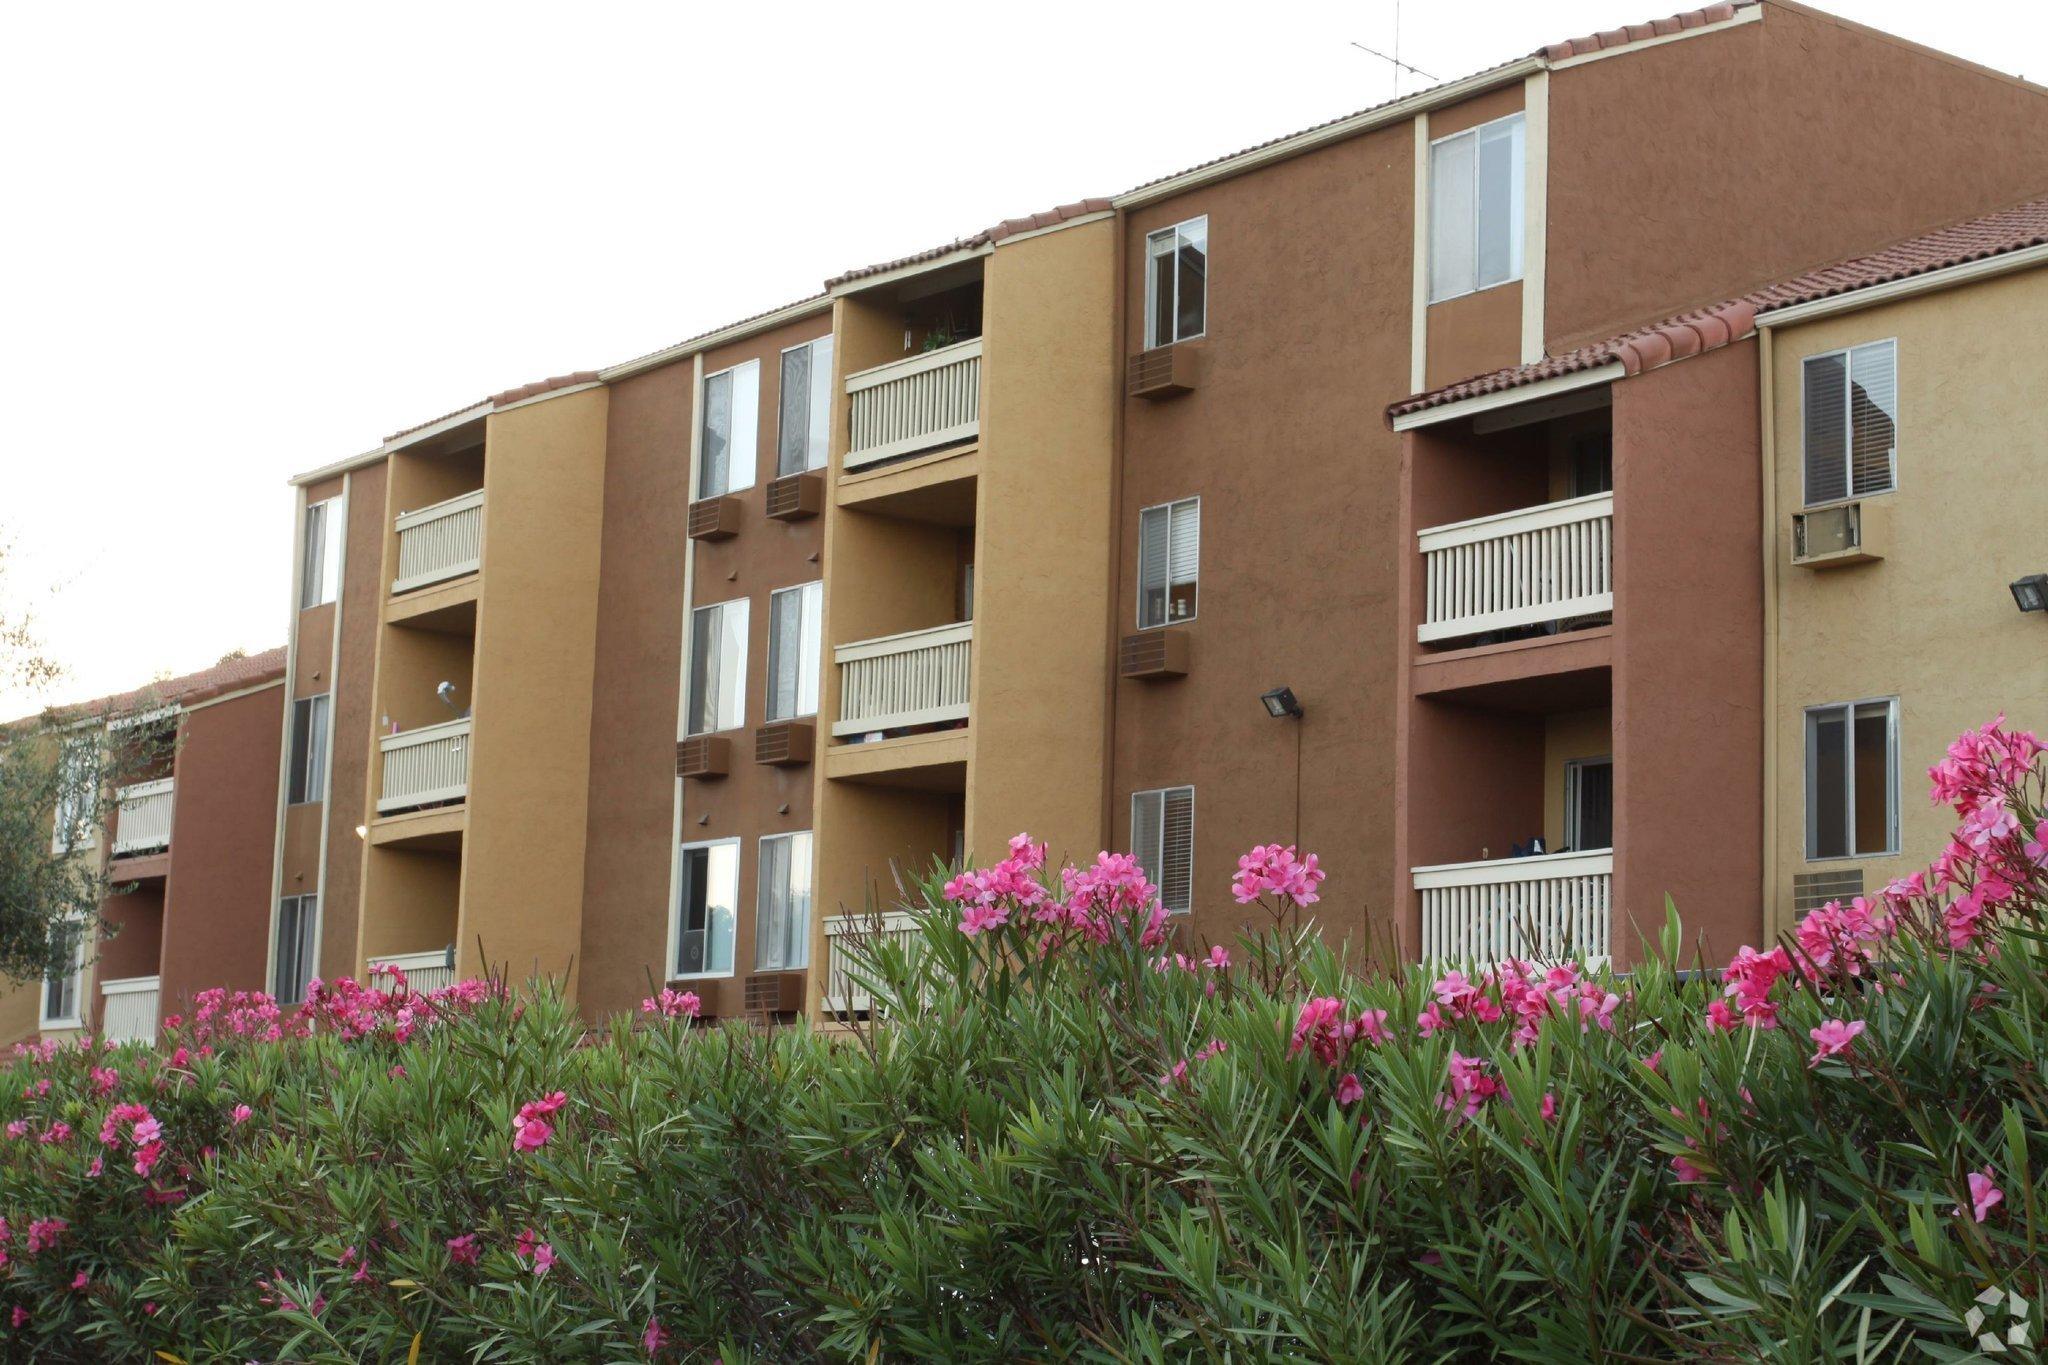 Apartment Buildings For Sale In Long Beach California